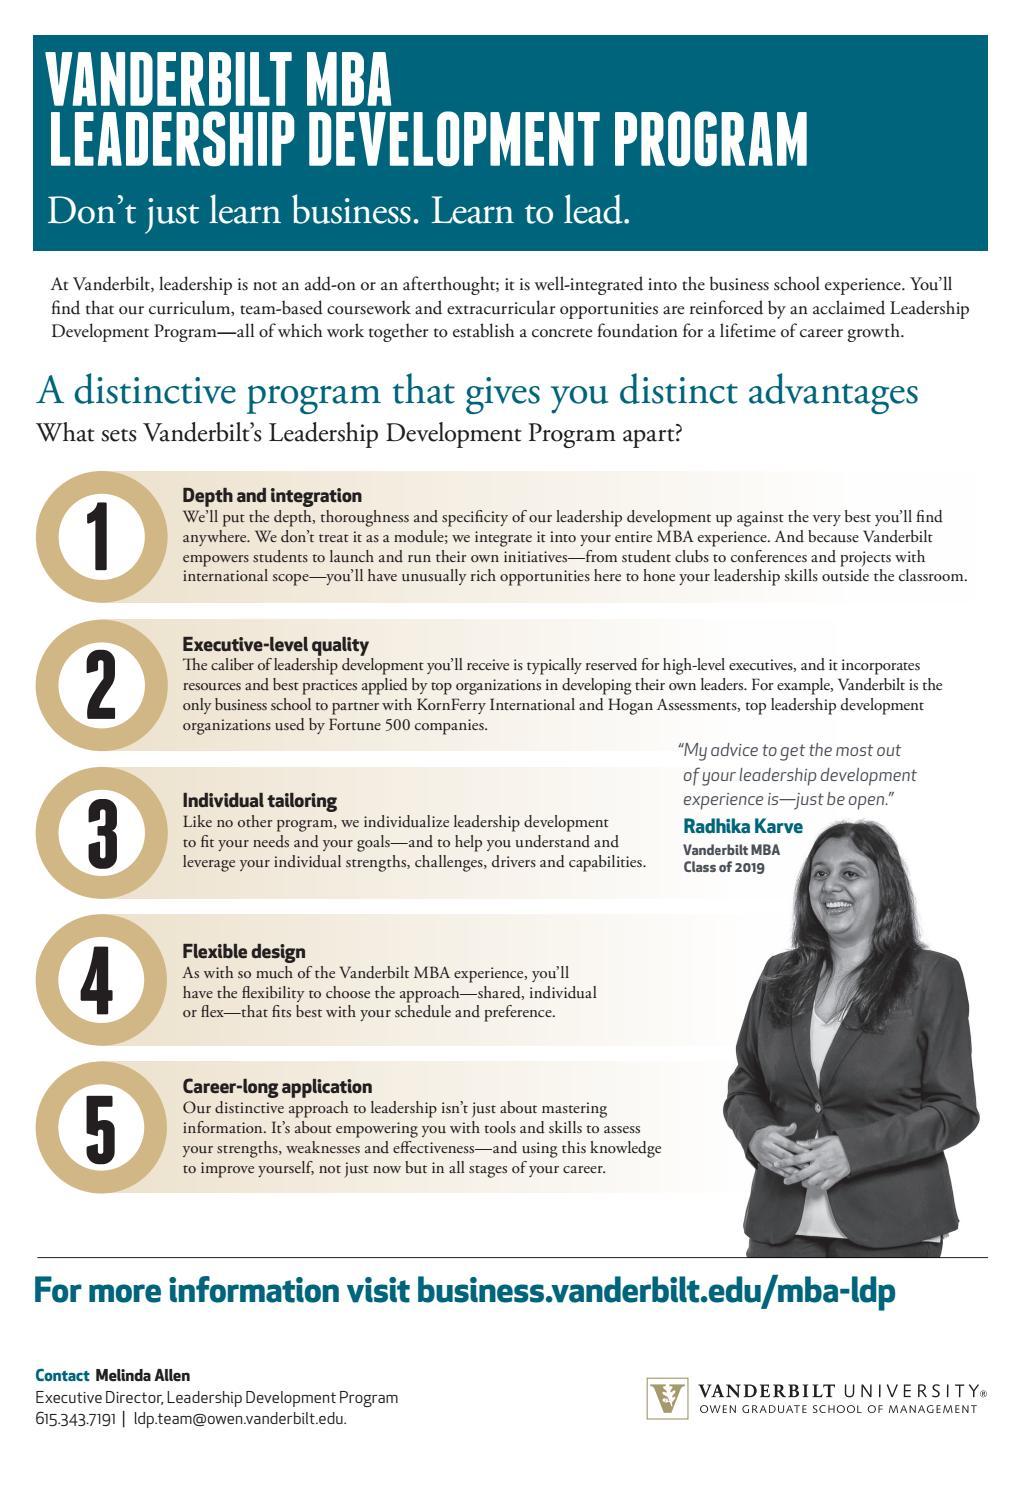 Mba Leadership Development Program By Vanderbilt Owen Graduate School Of Management Issuu